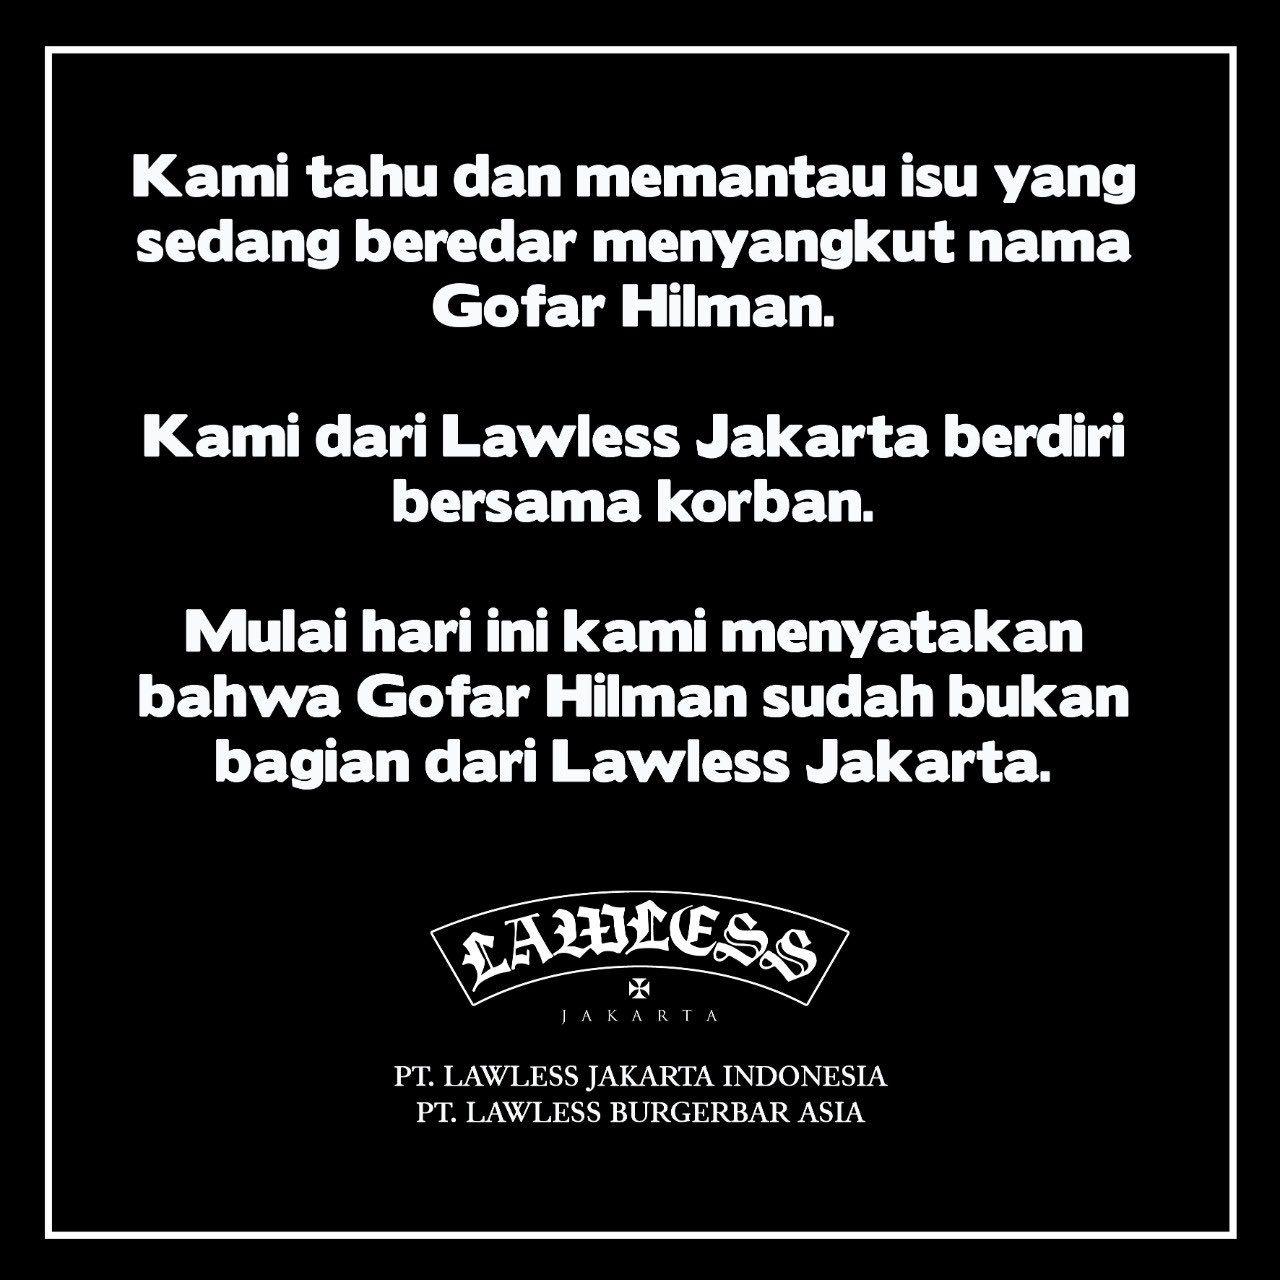 Pernyataan Lawless Jakarta soal Gofar Hilman